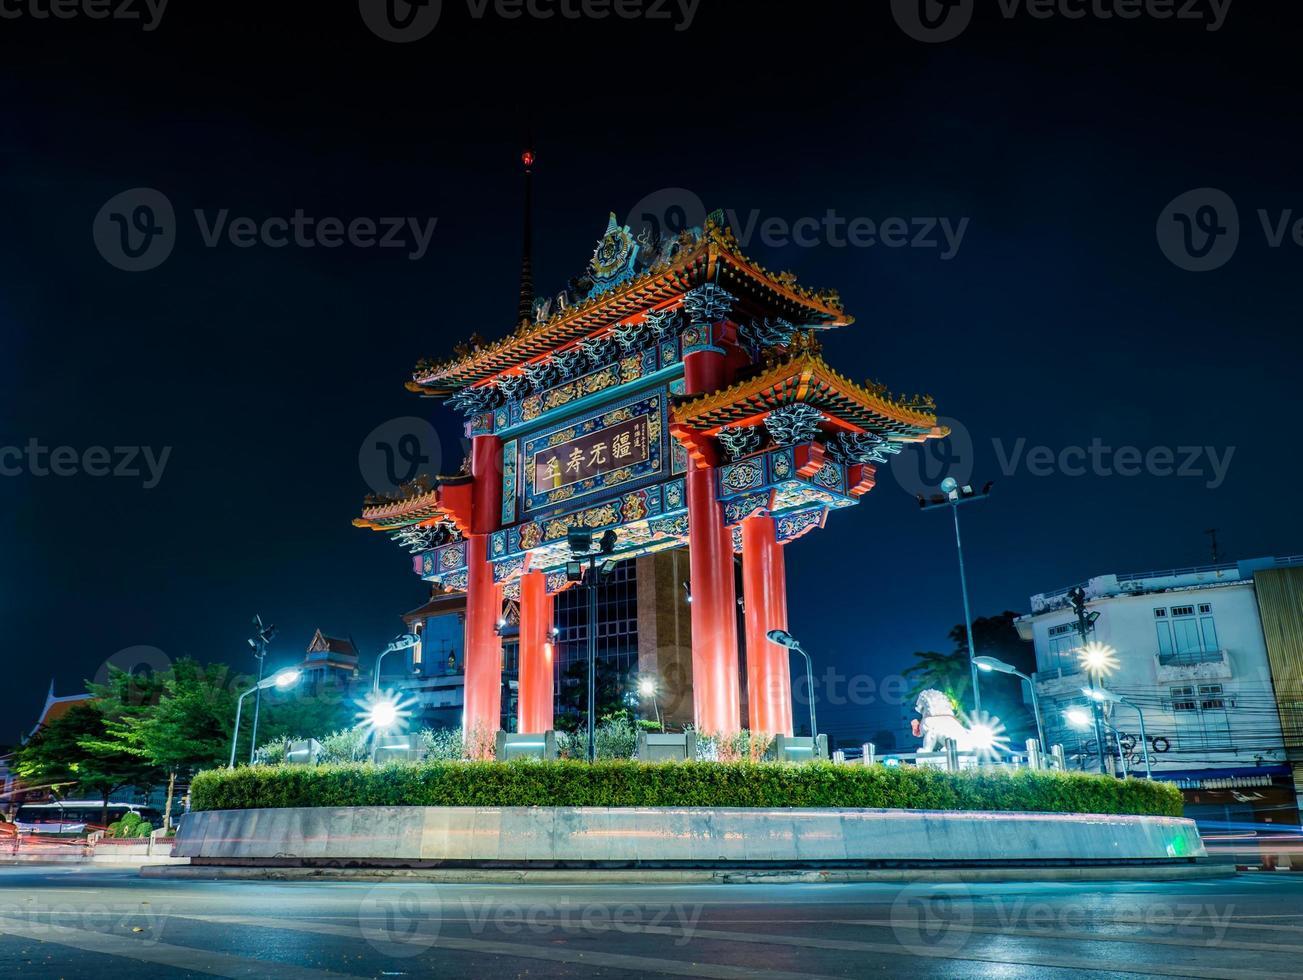 de gateway-boog (odeon-cirkel), oriëntatiepunt van chinatown bangkok thailand foto